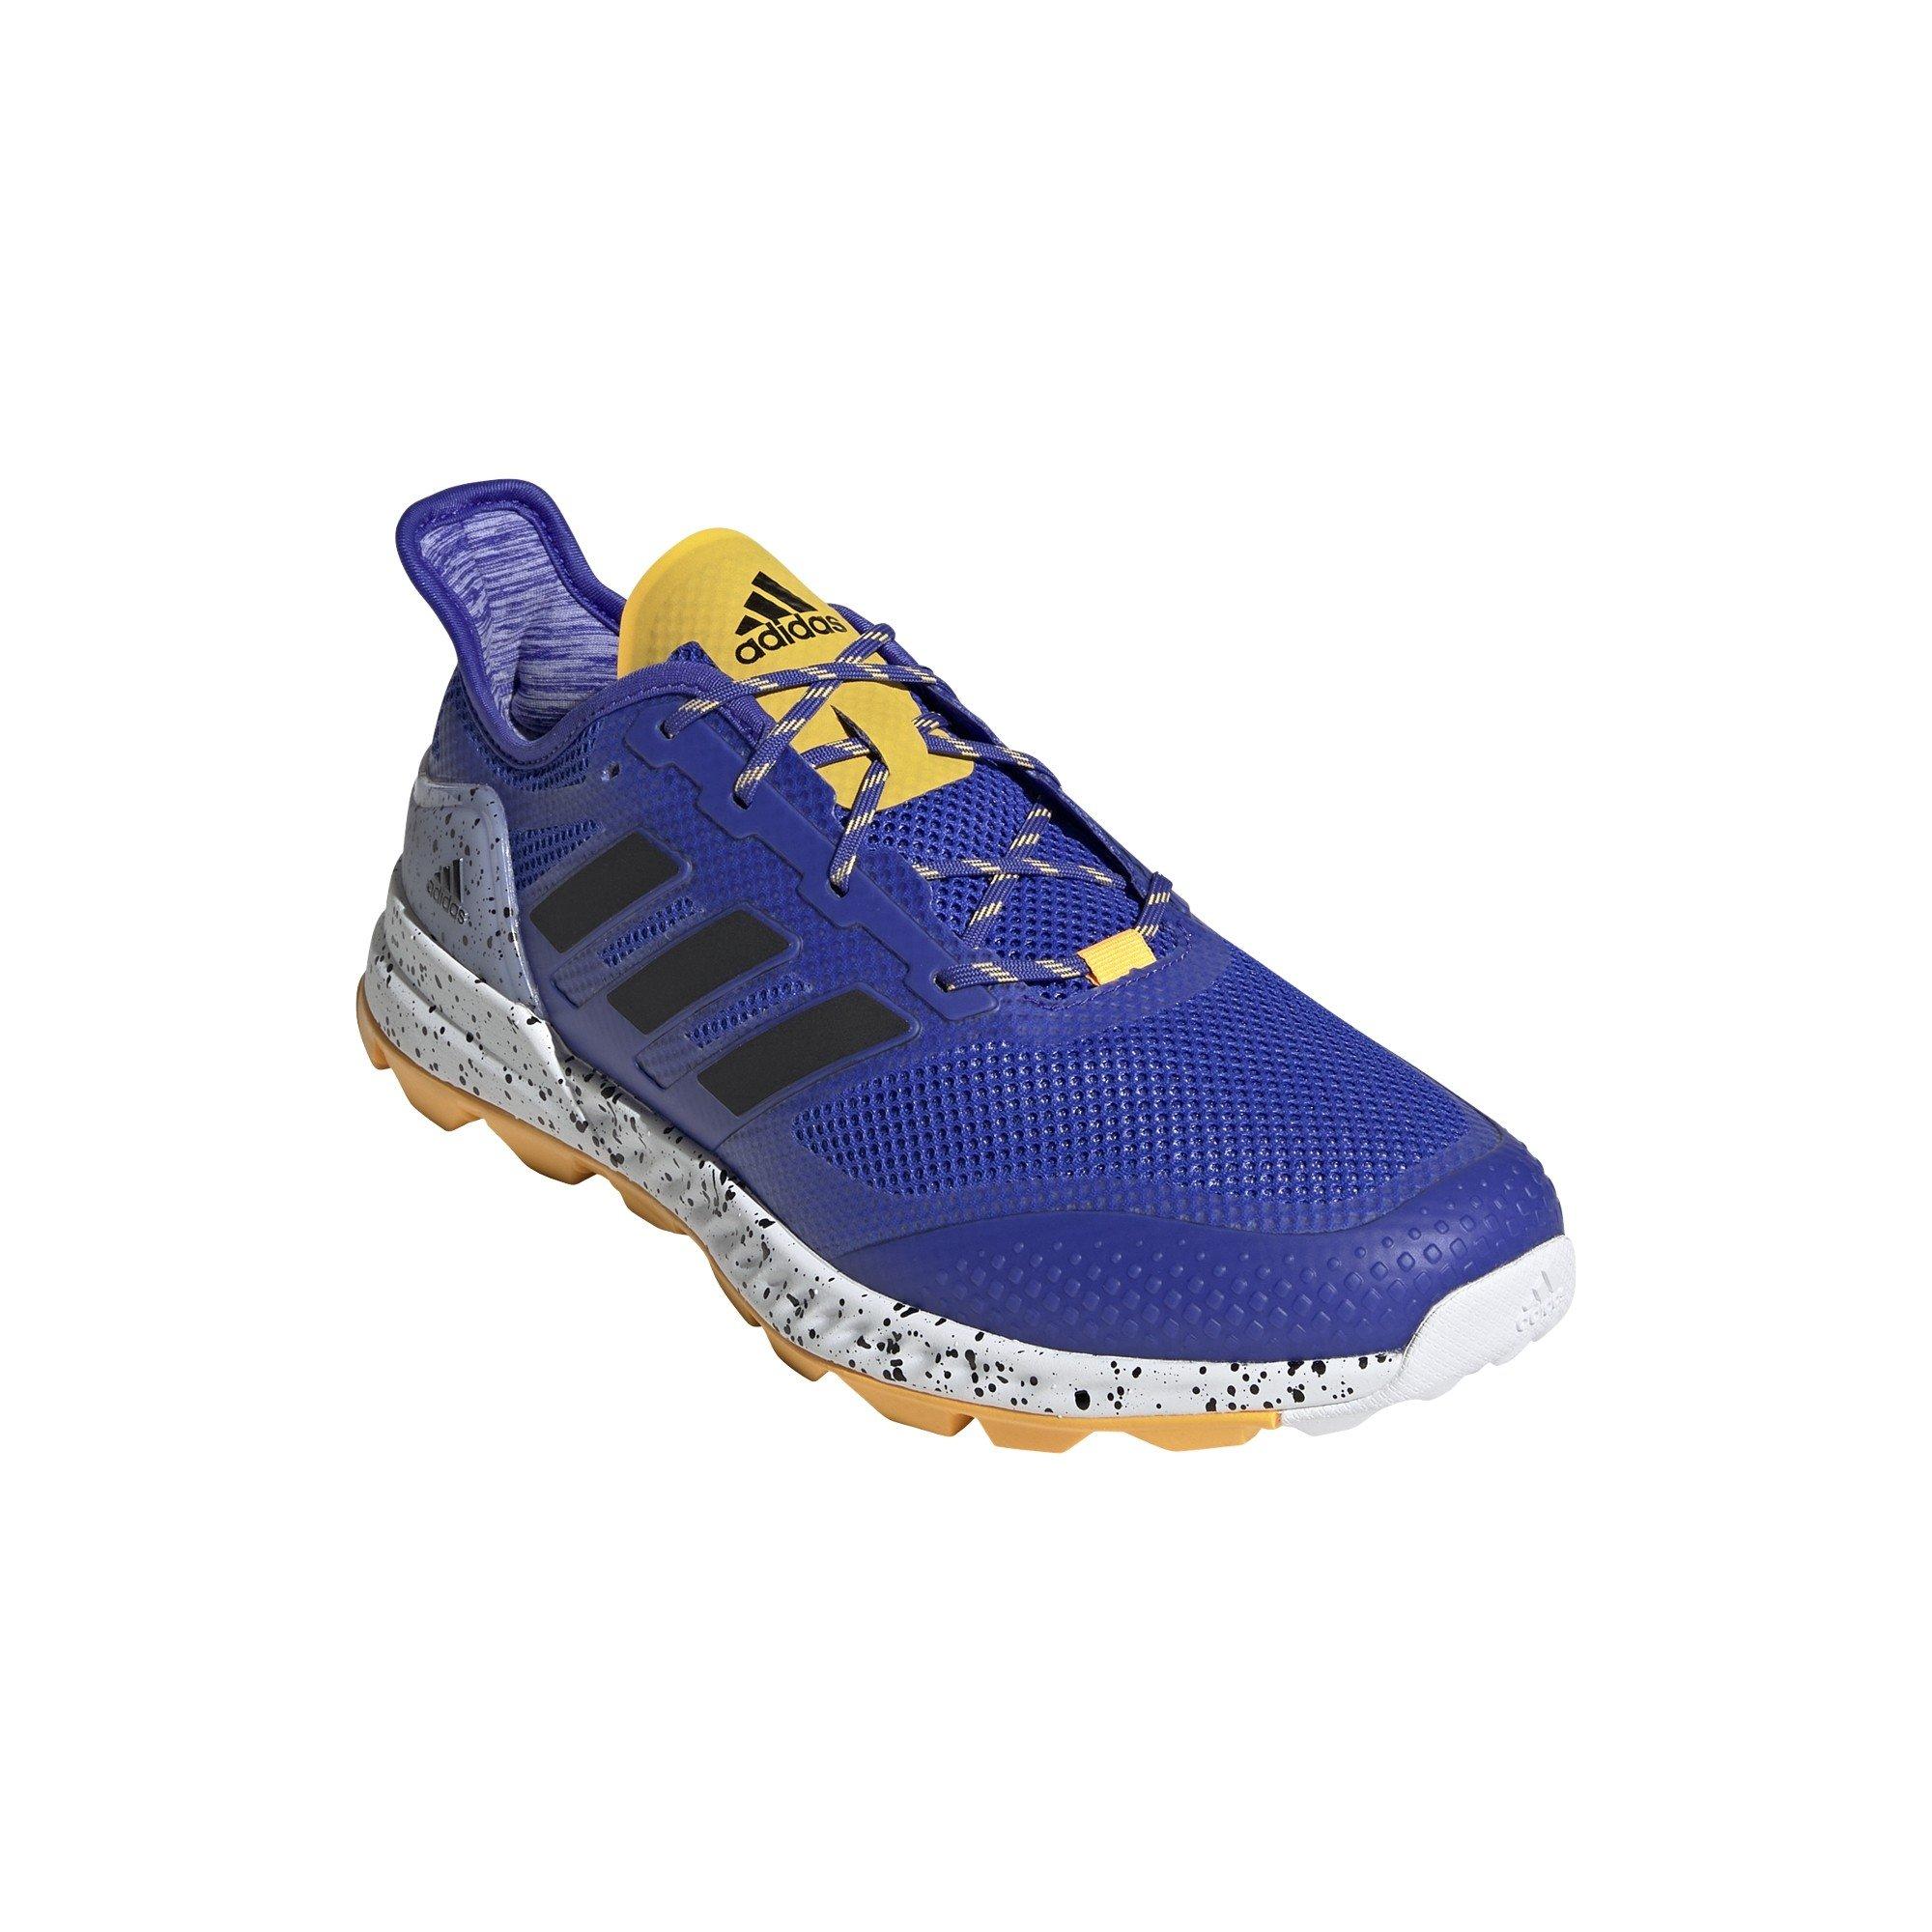 Adidas Adipower 2.1 Hockey Shoes - Blue/White/Yellow